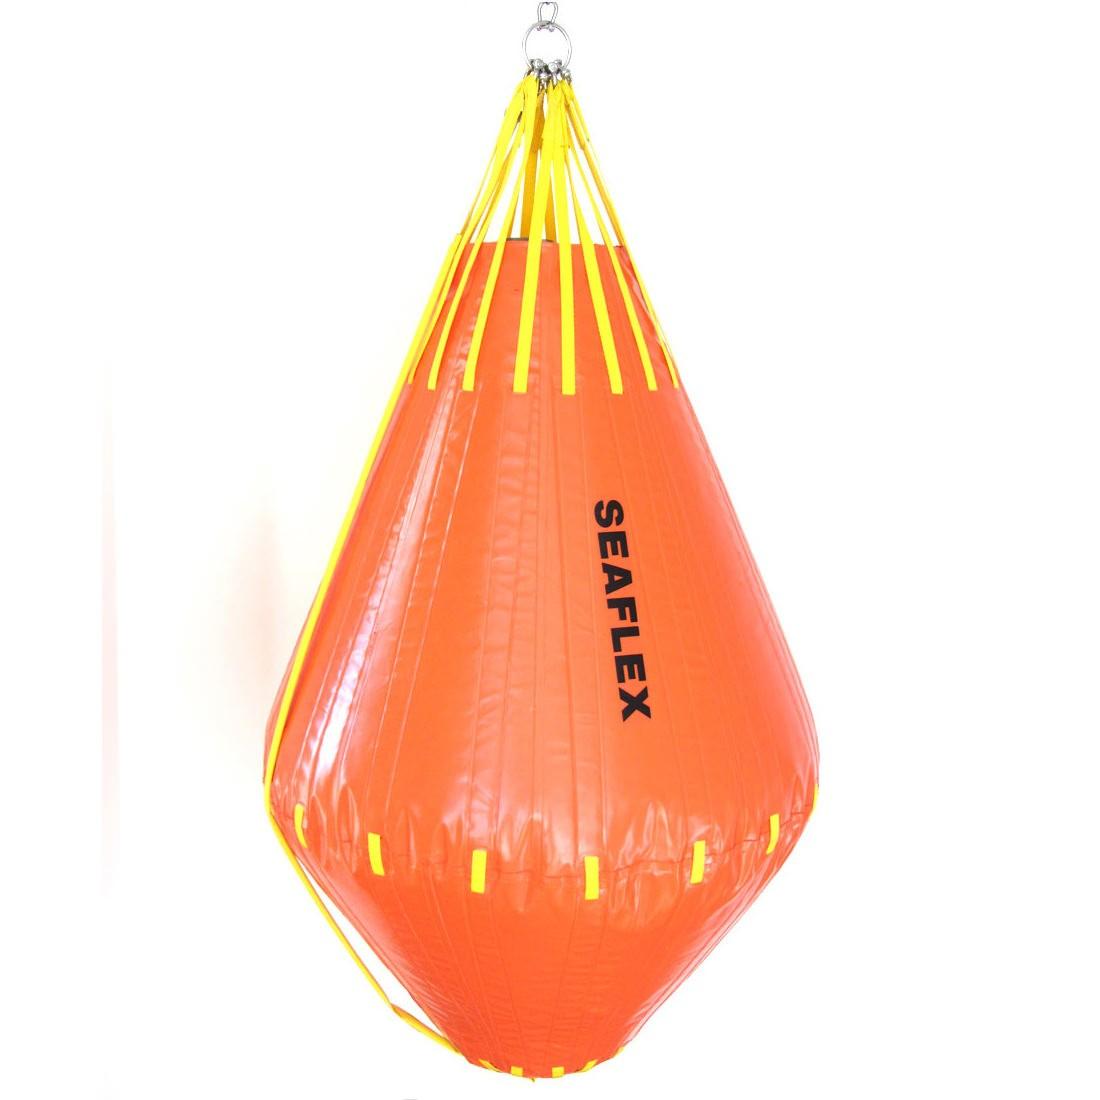 Seaflex Waterload Bag 55000 lbs Lift Capacity SEF-25-WLB